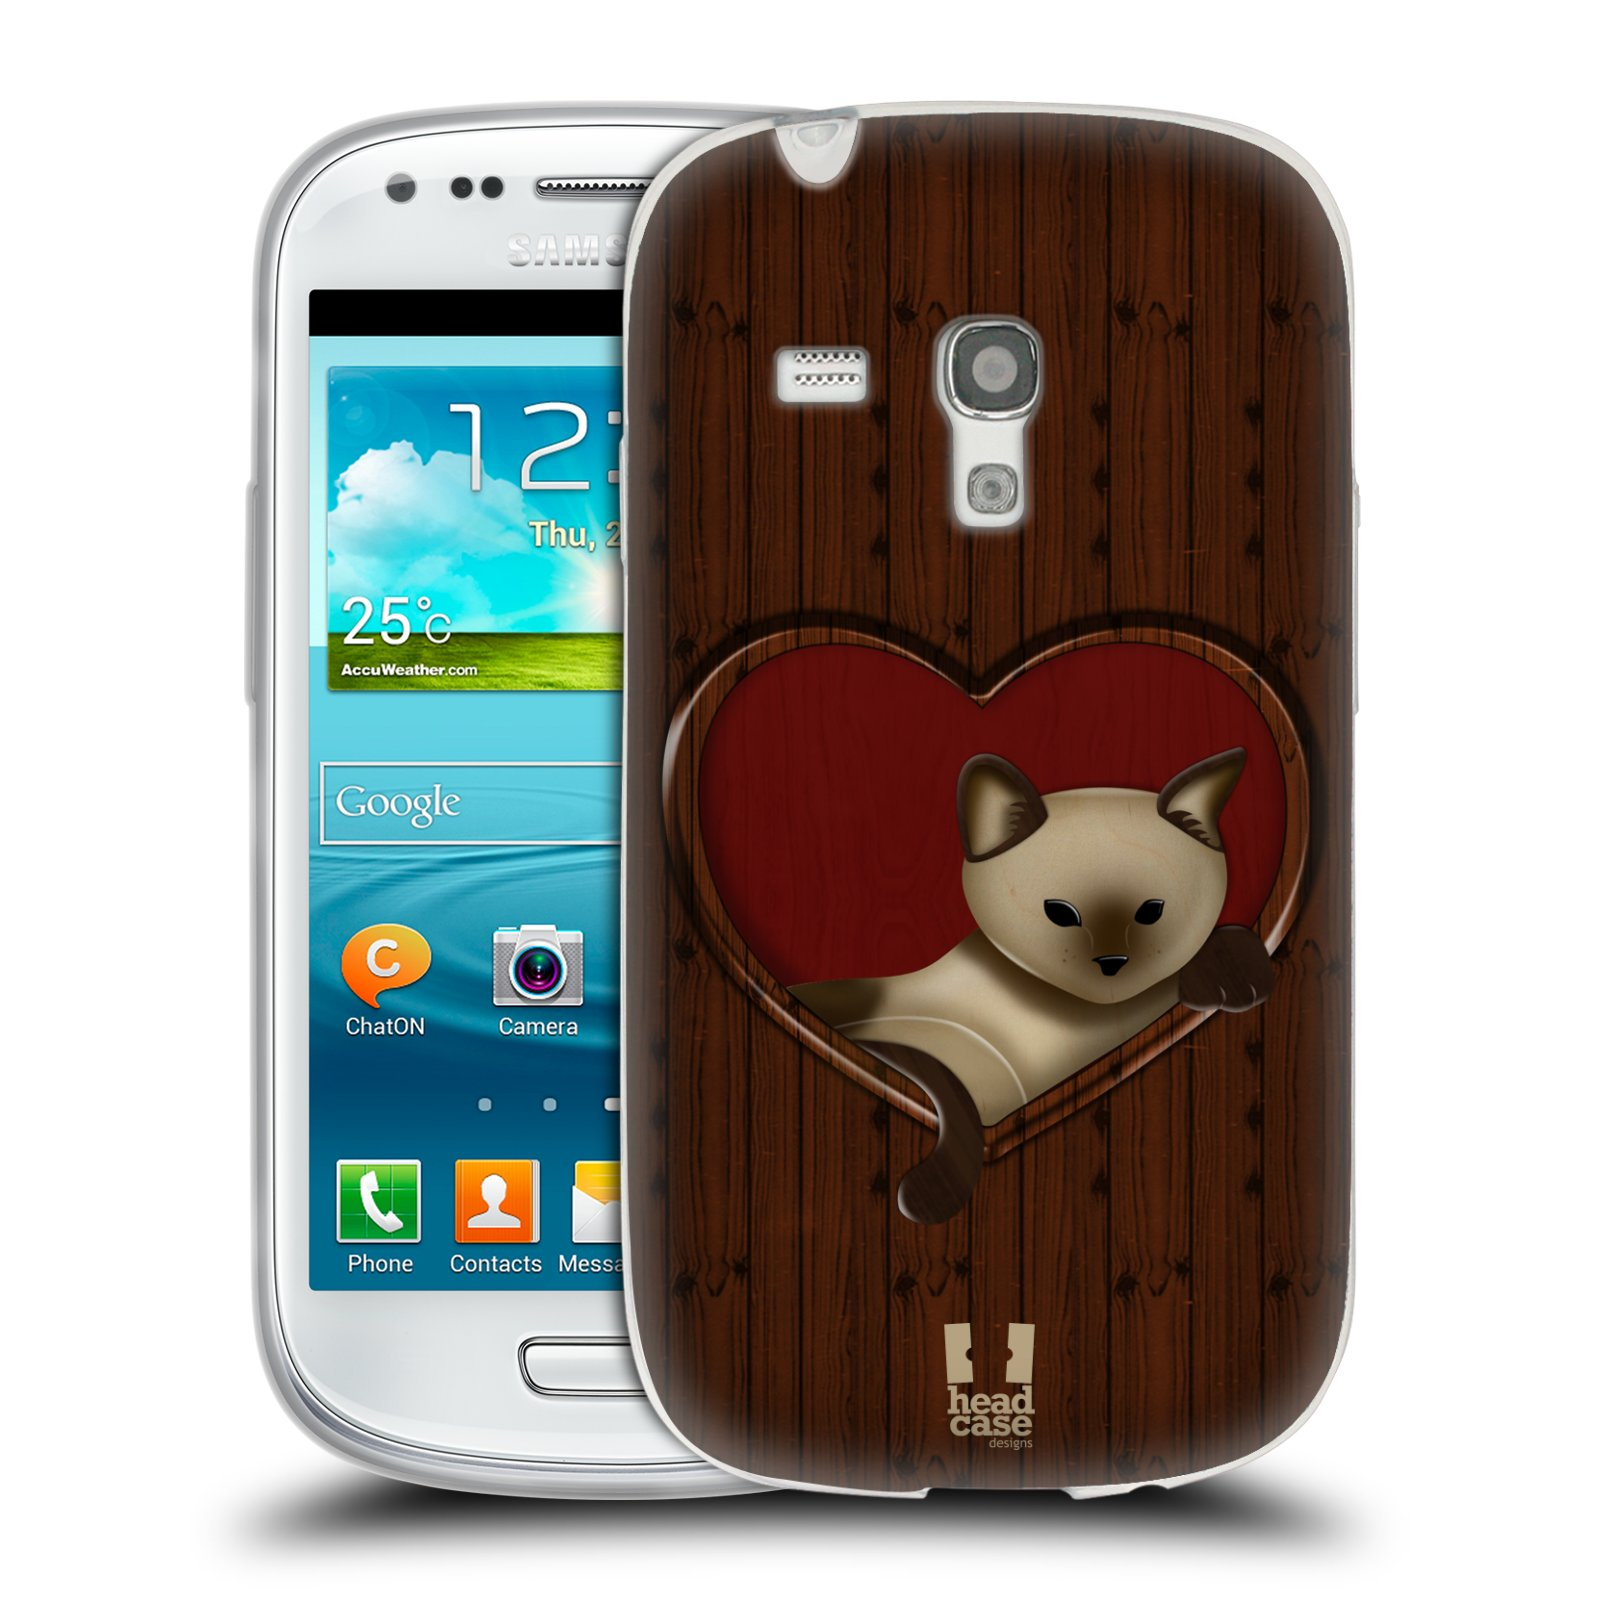 HEAD CASE silikonový obal na mobil Samsung Galaxy S3 MINI i8190 vzor Dřevěné umění 2 KOČIČKA V SRDCI